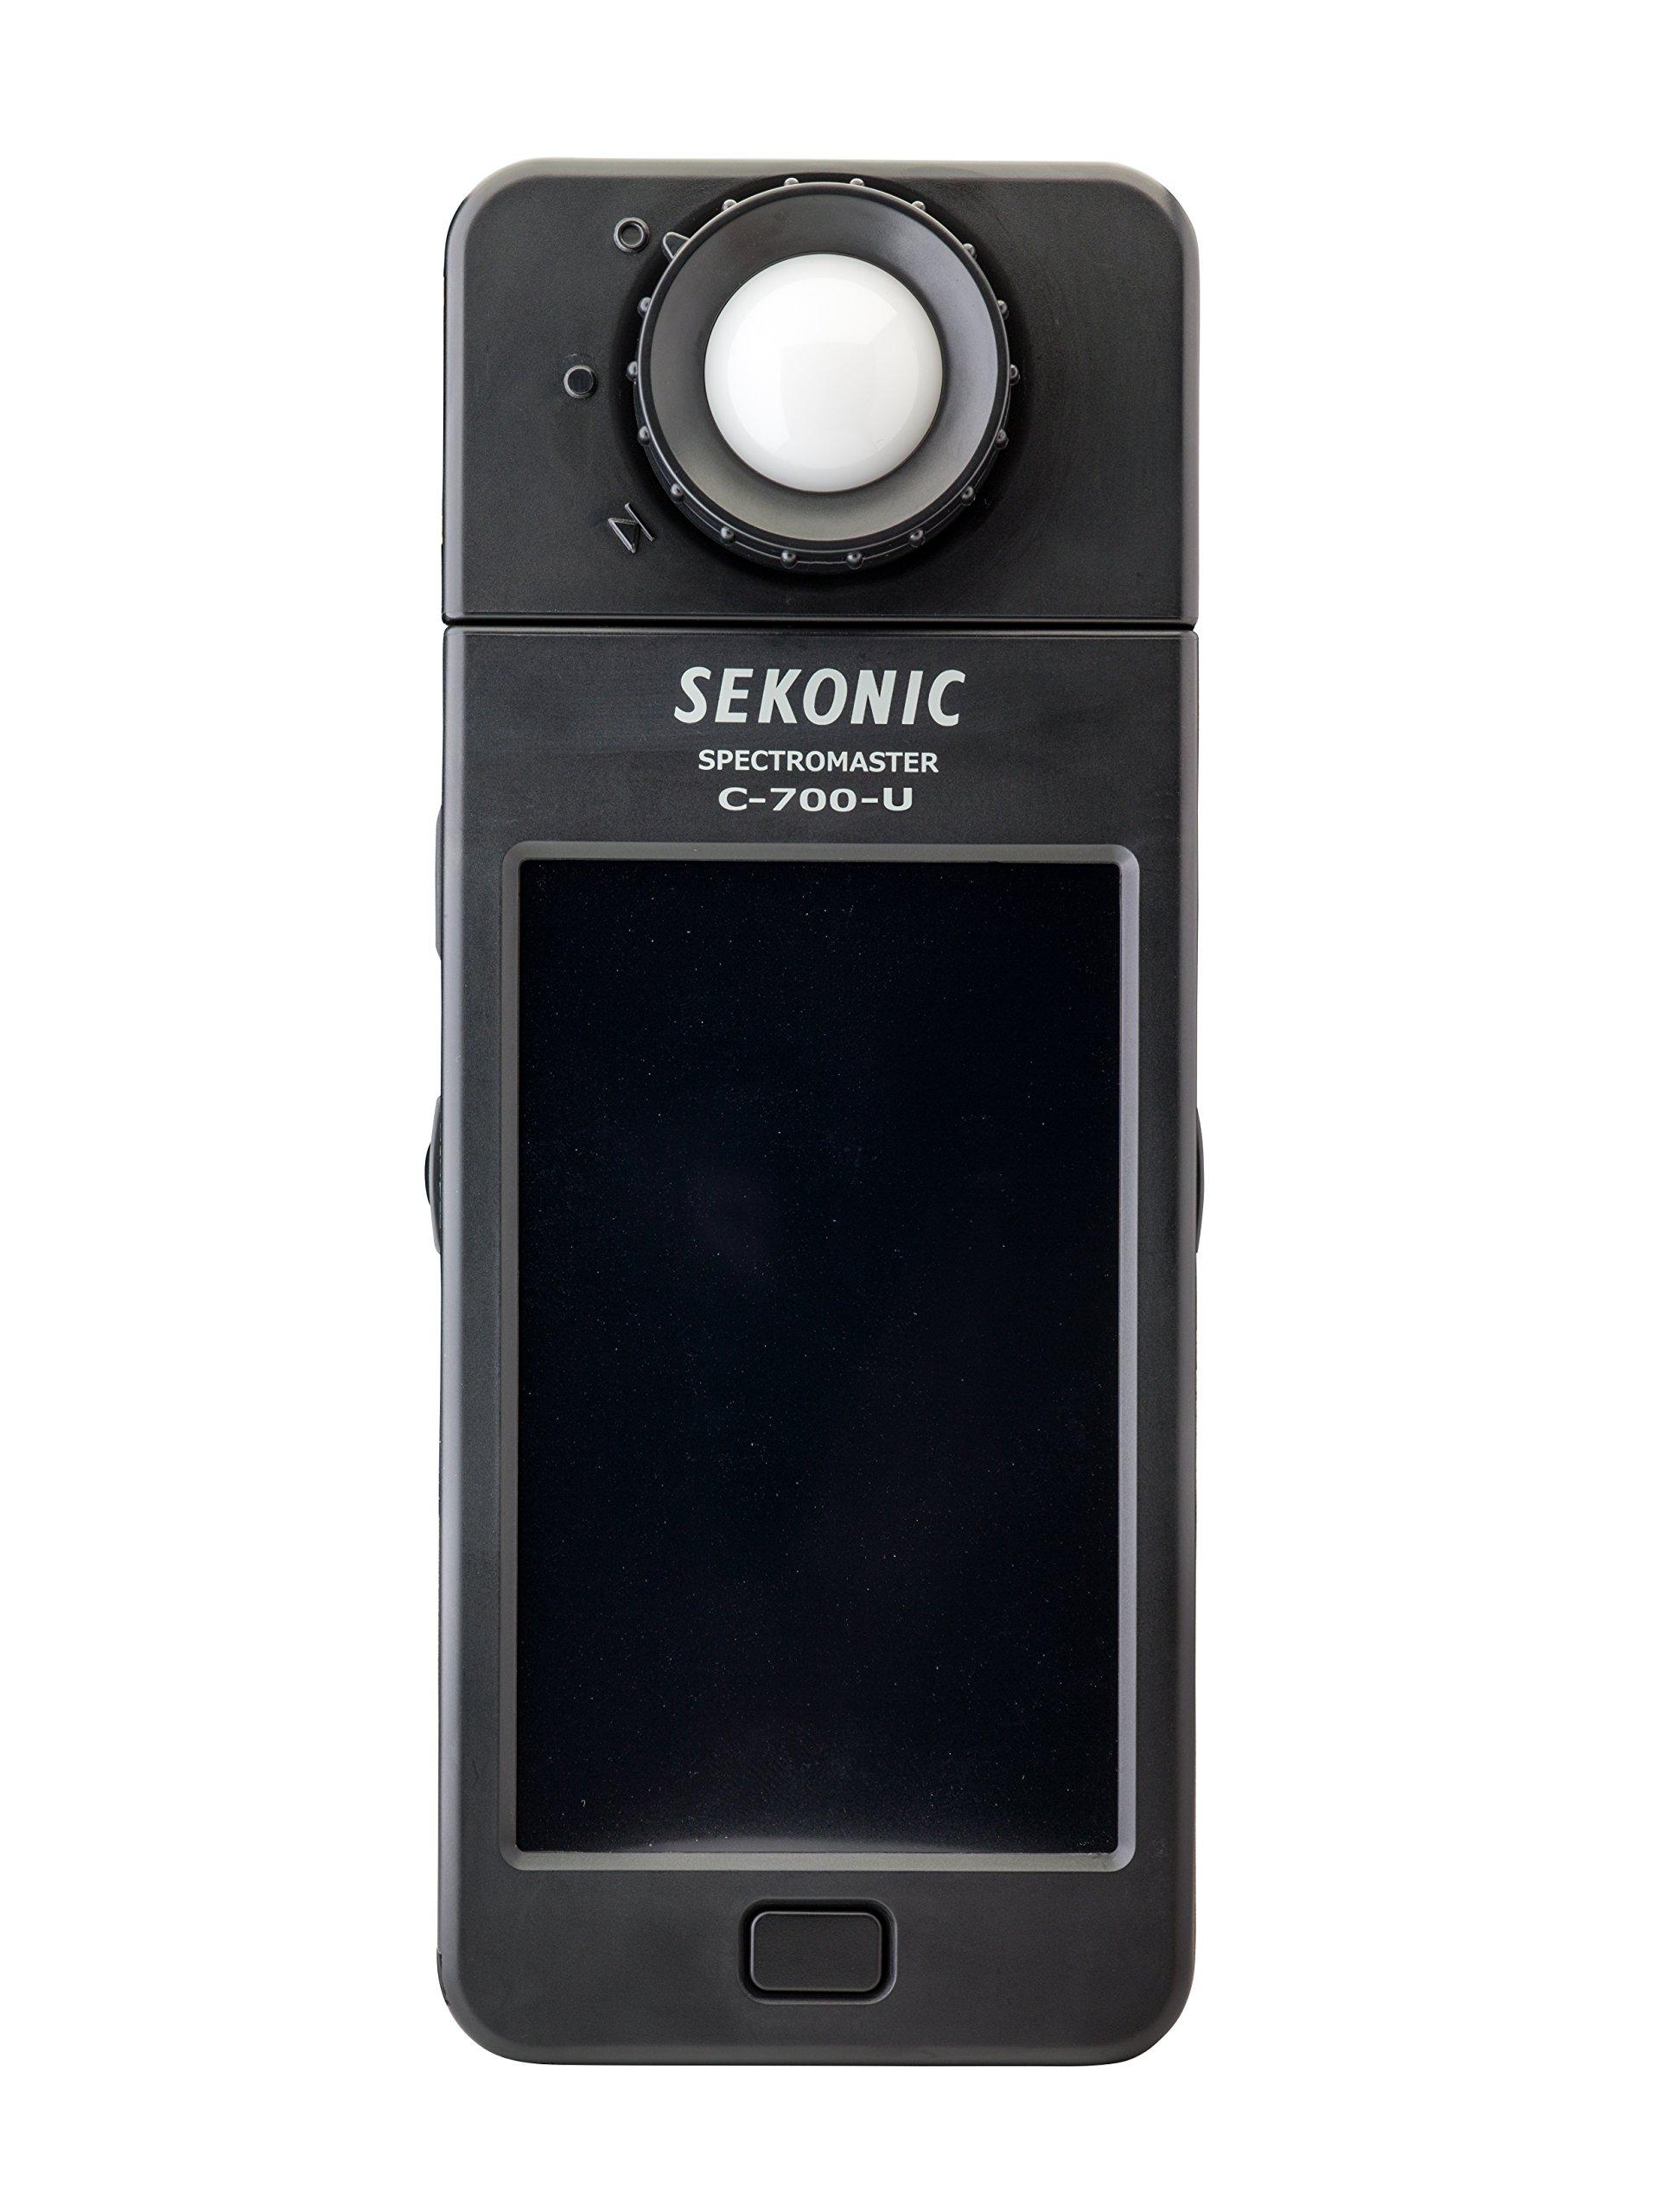 Sekonic C-700-U Spectromaster Color Meter (401-702) by Sekonic